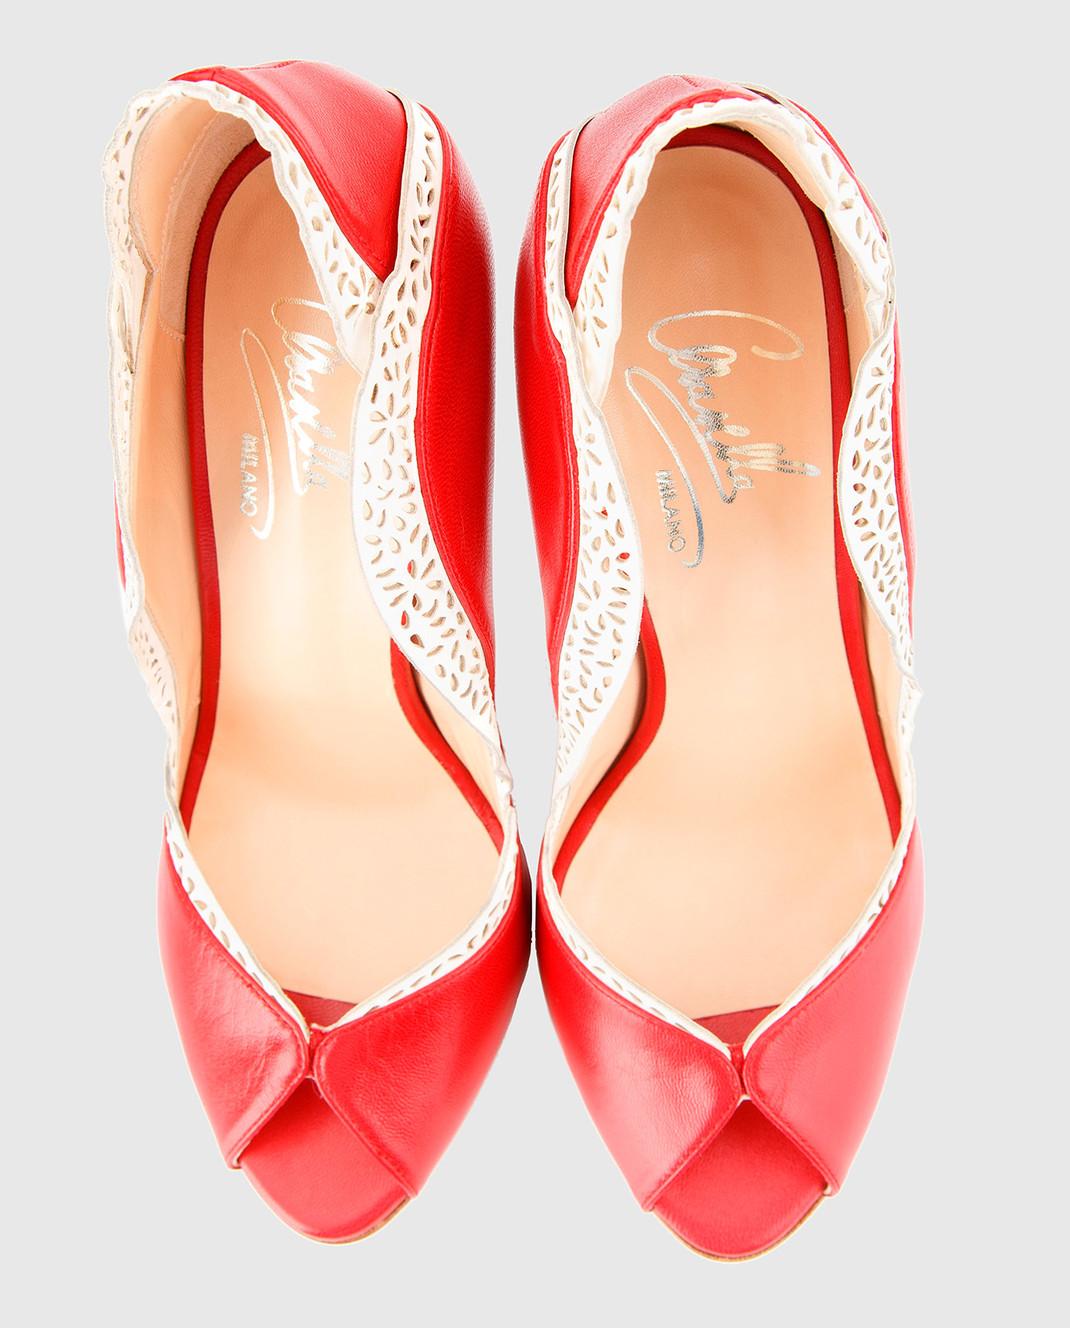 Cerasella Красные кожаные туфли DANAECAPRETTO DANAECAPRETTO изображение 5